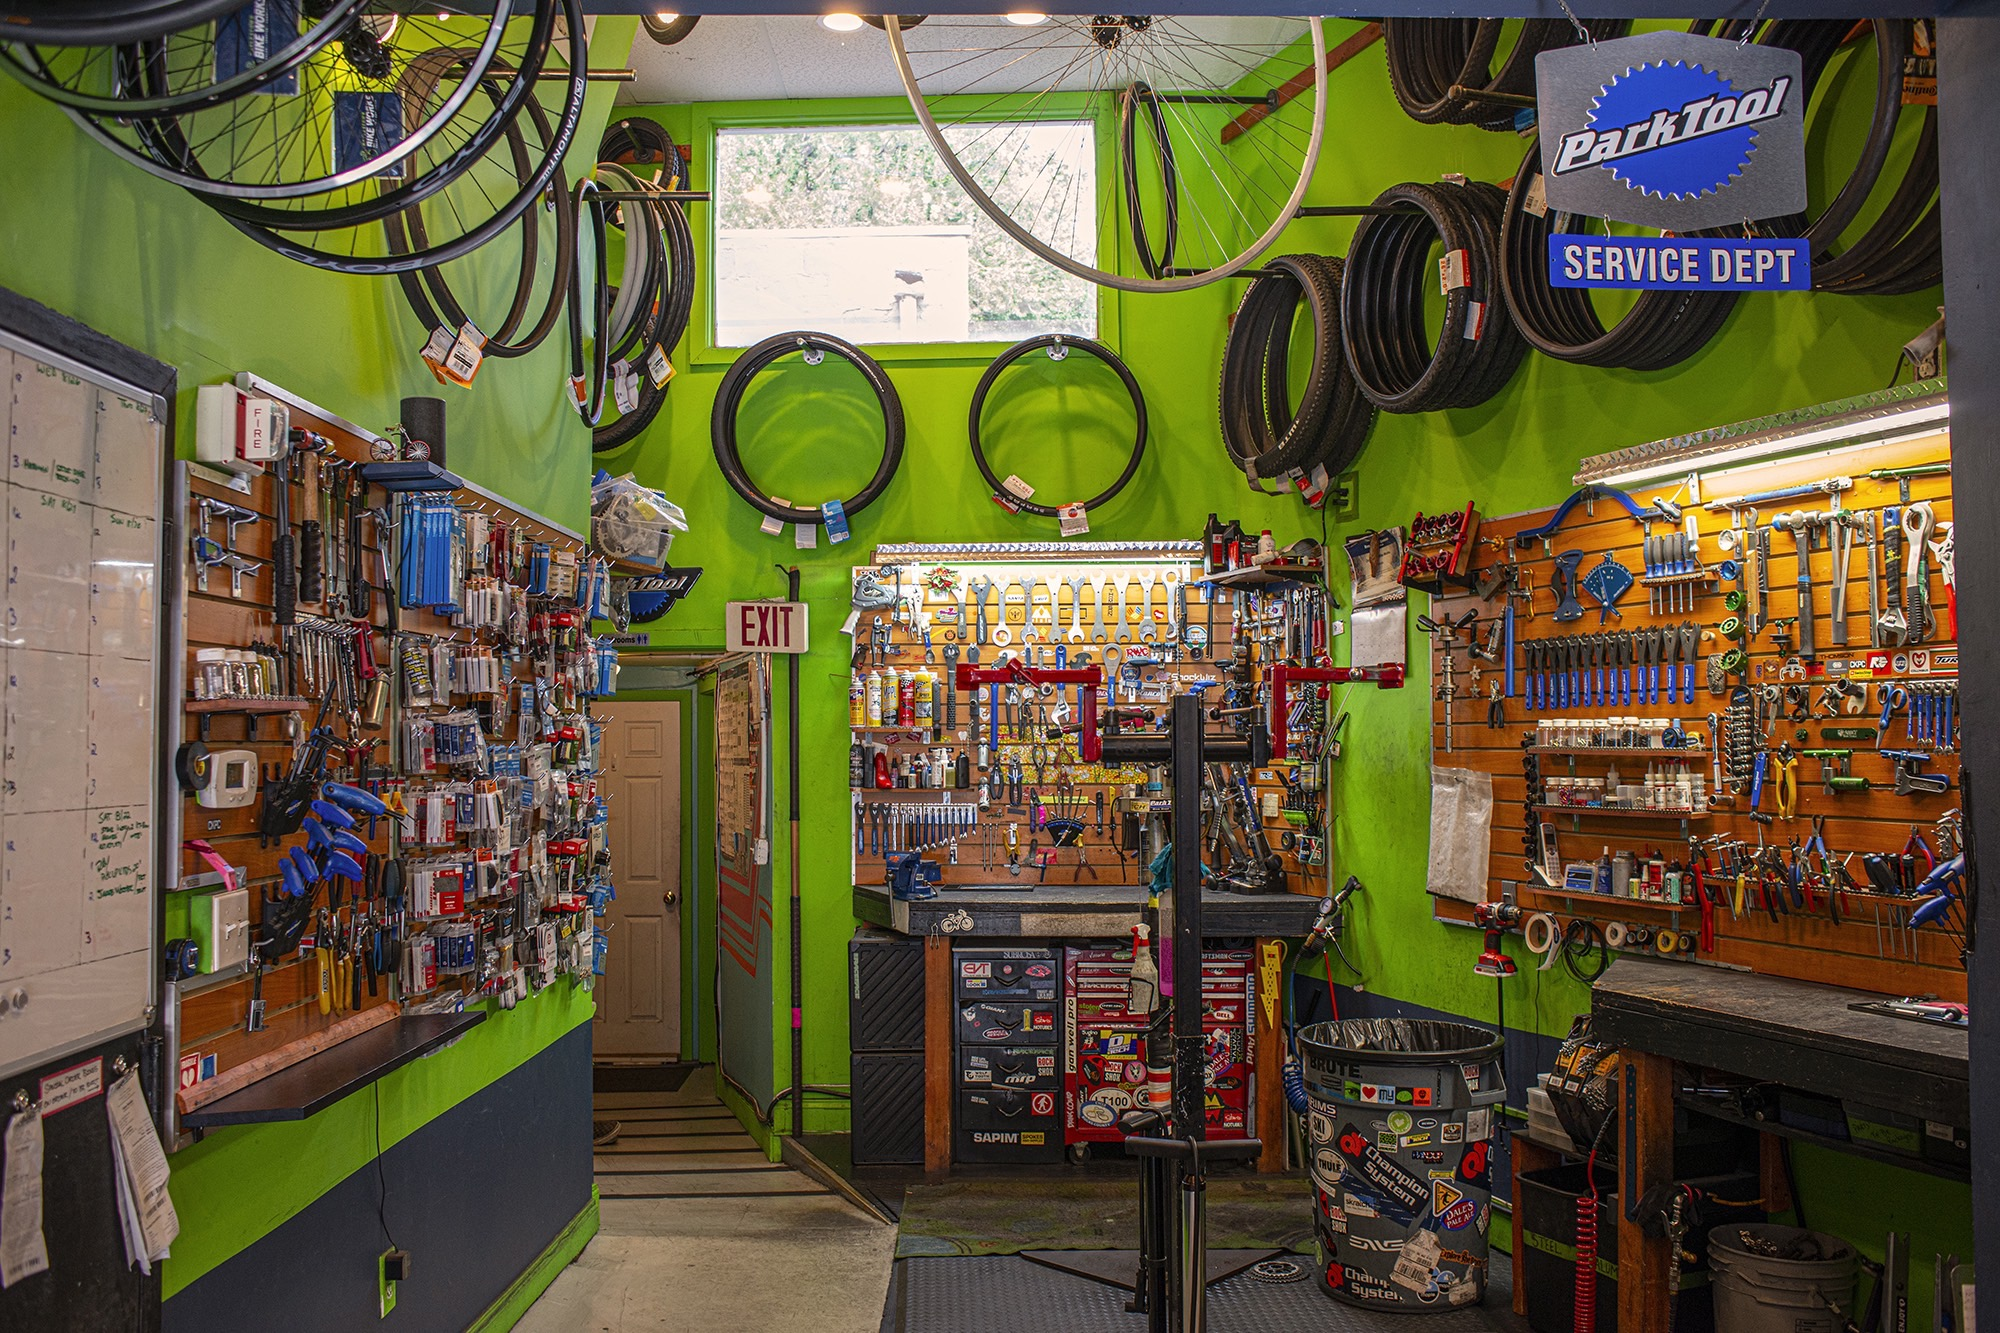 Bicycle Service Station at Bike Works Doylestown